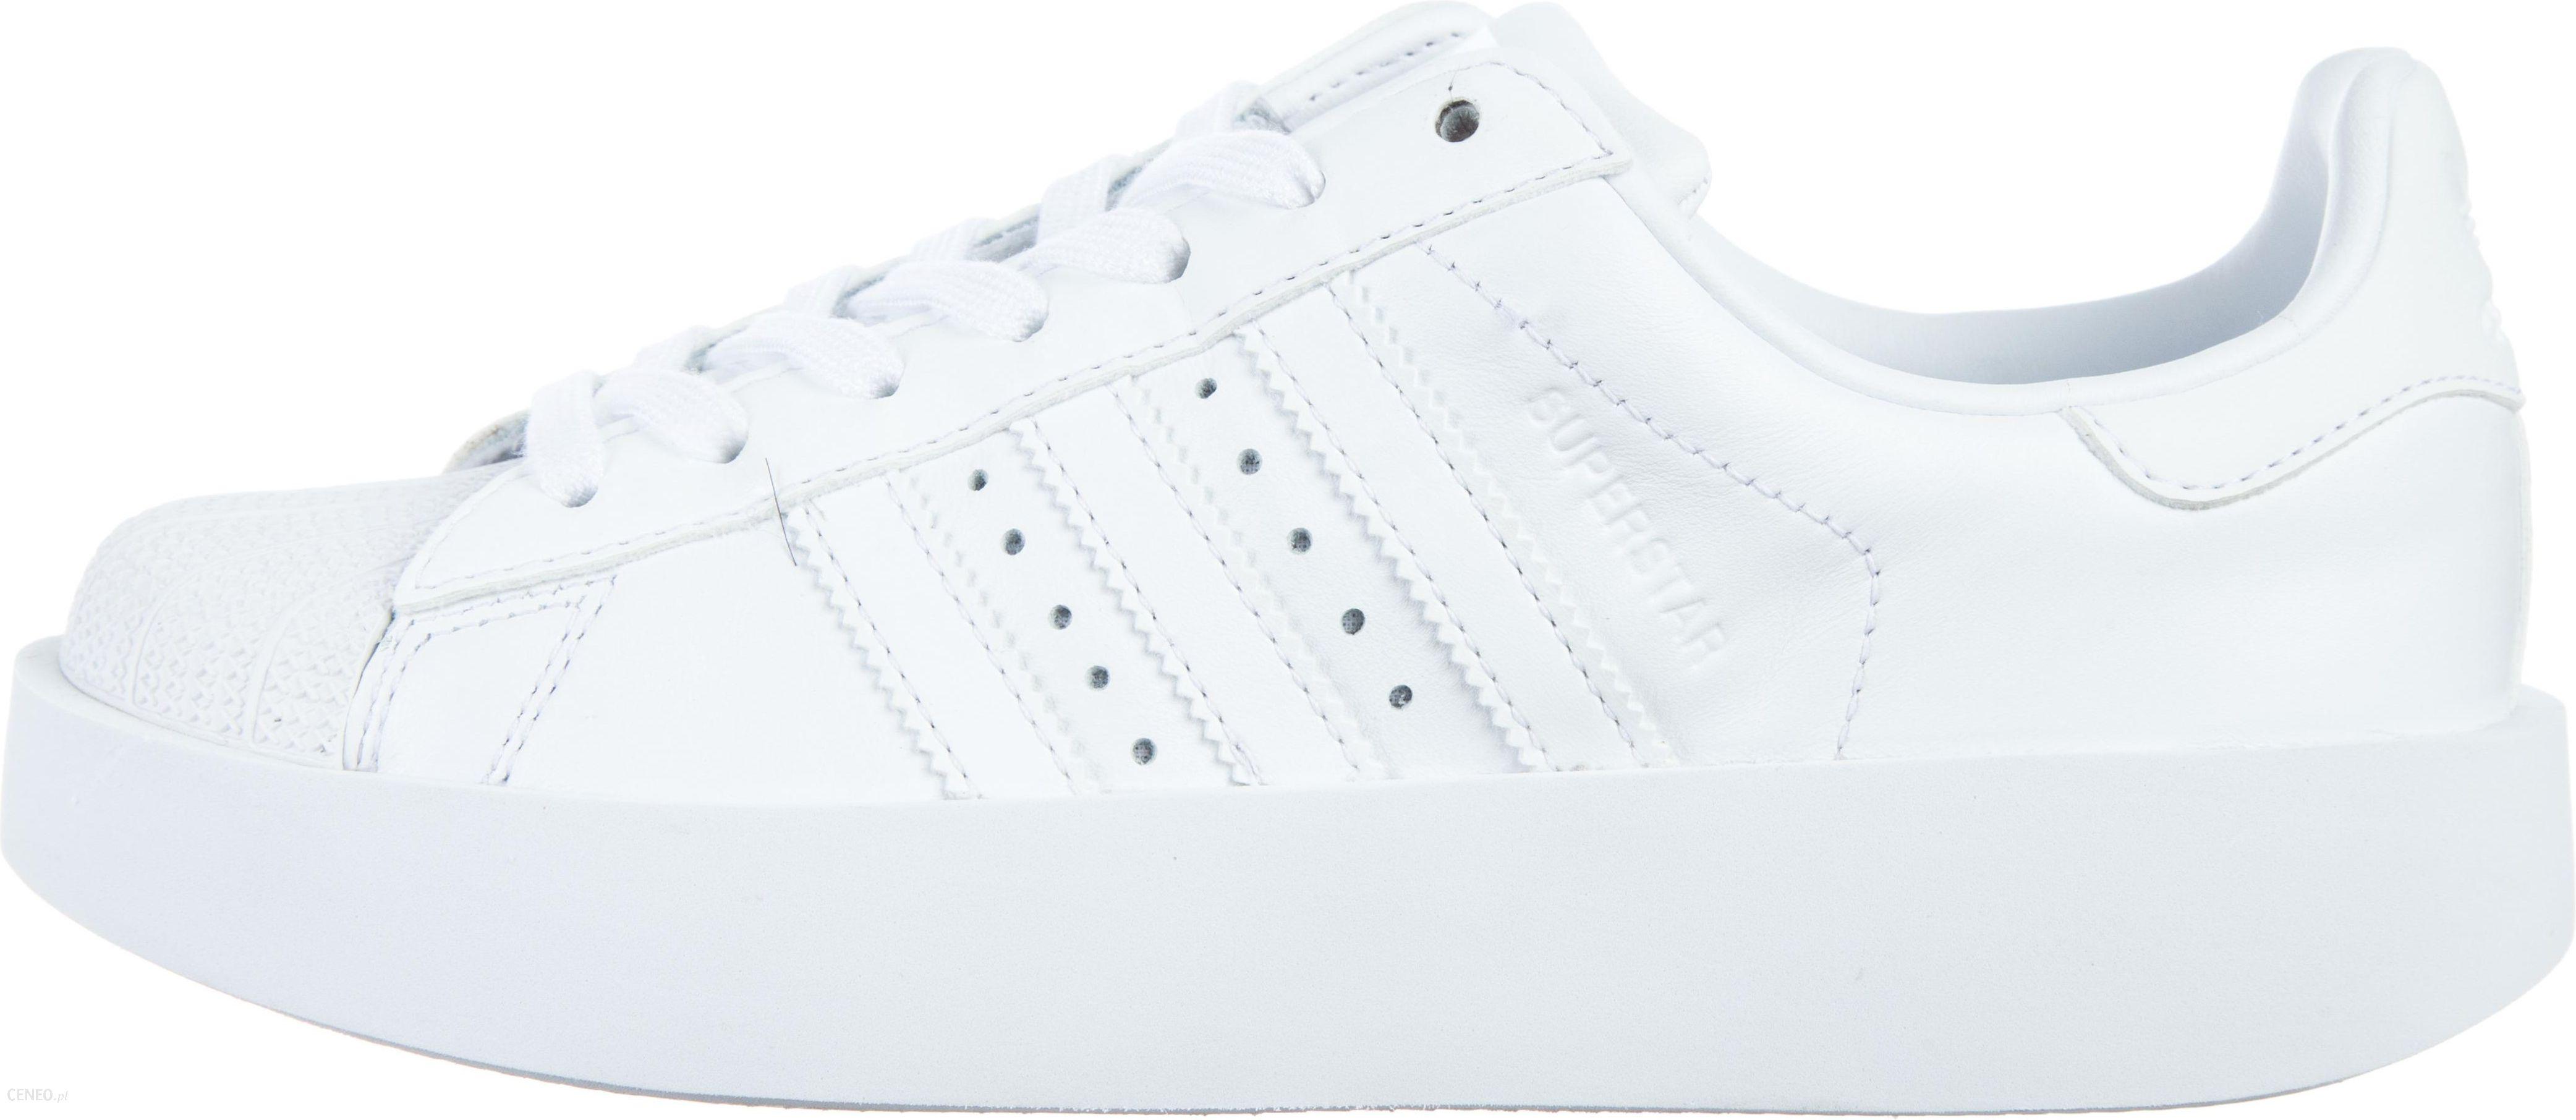 adidas Originals Superstar Bold Tenisówki Biały 38